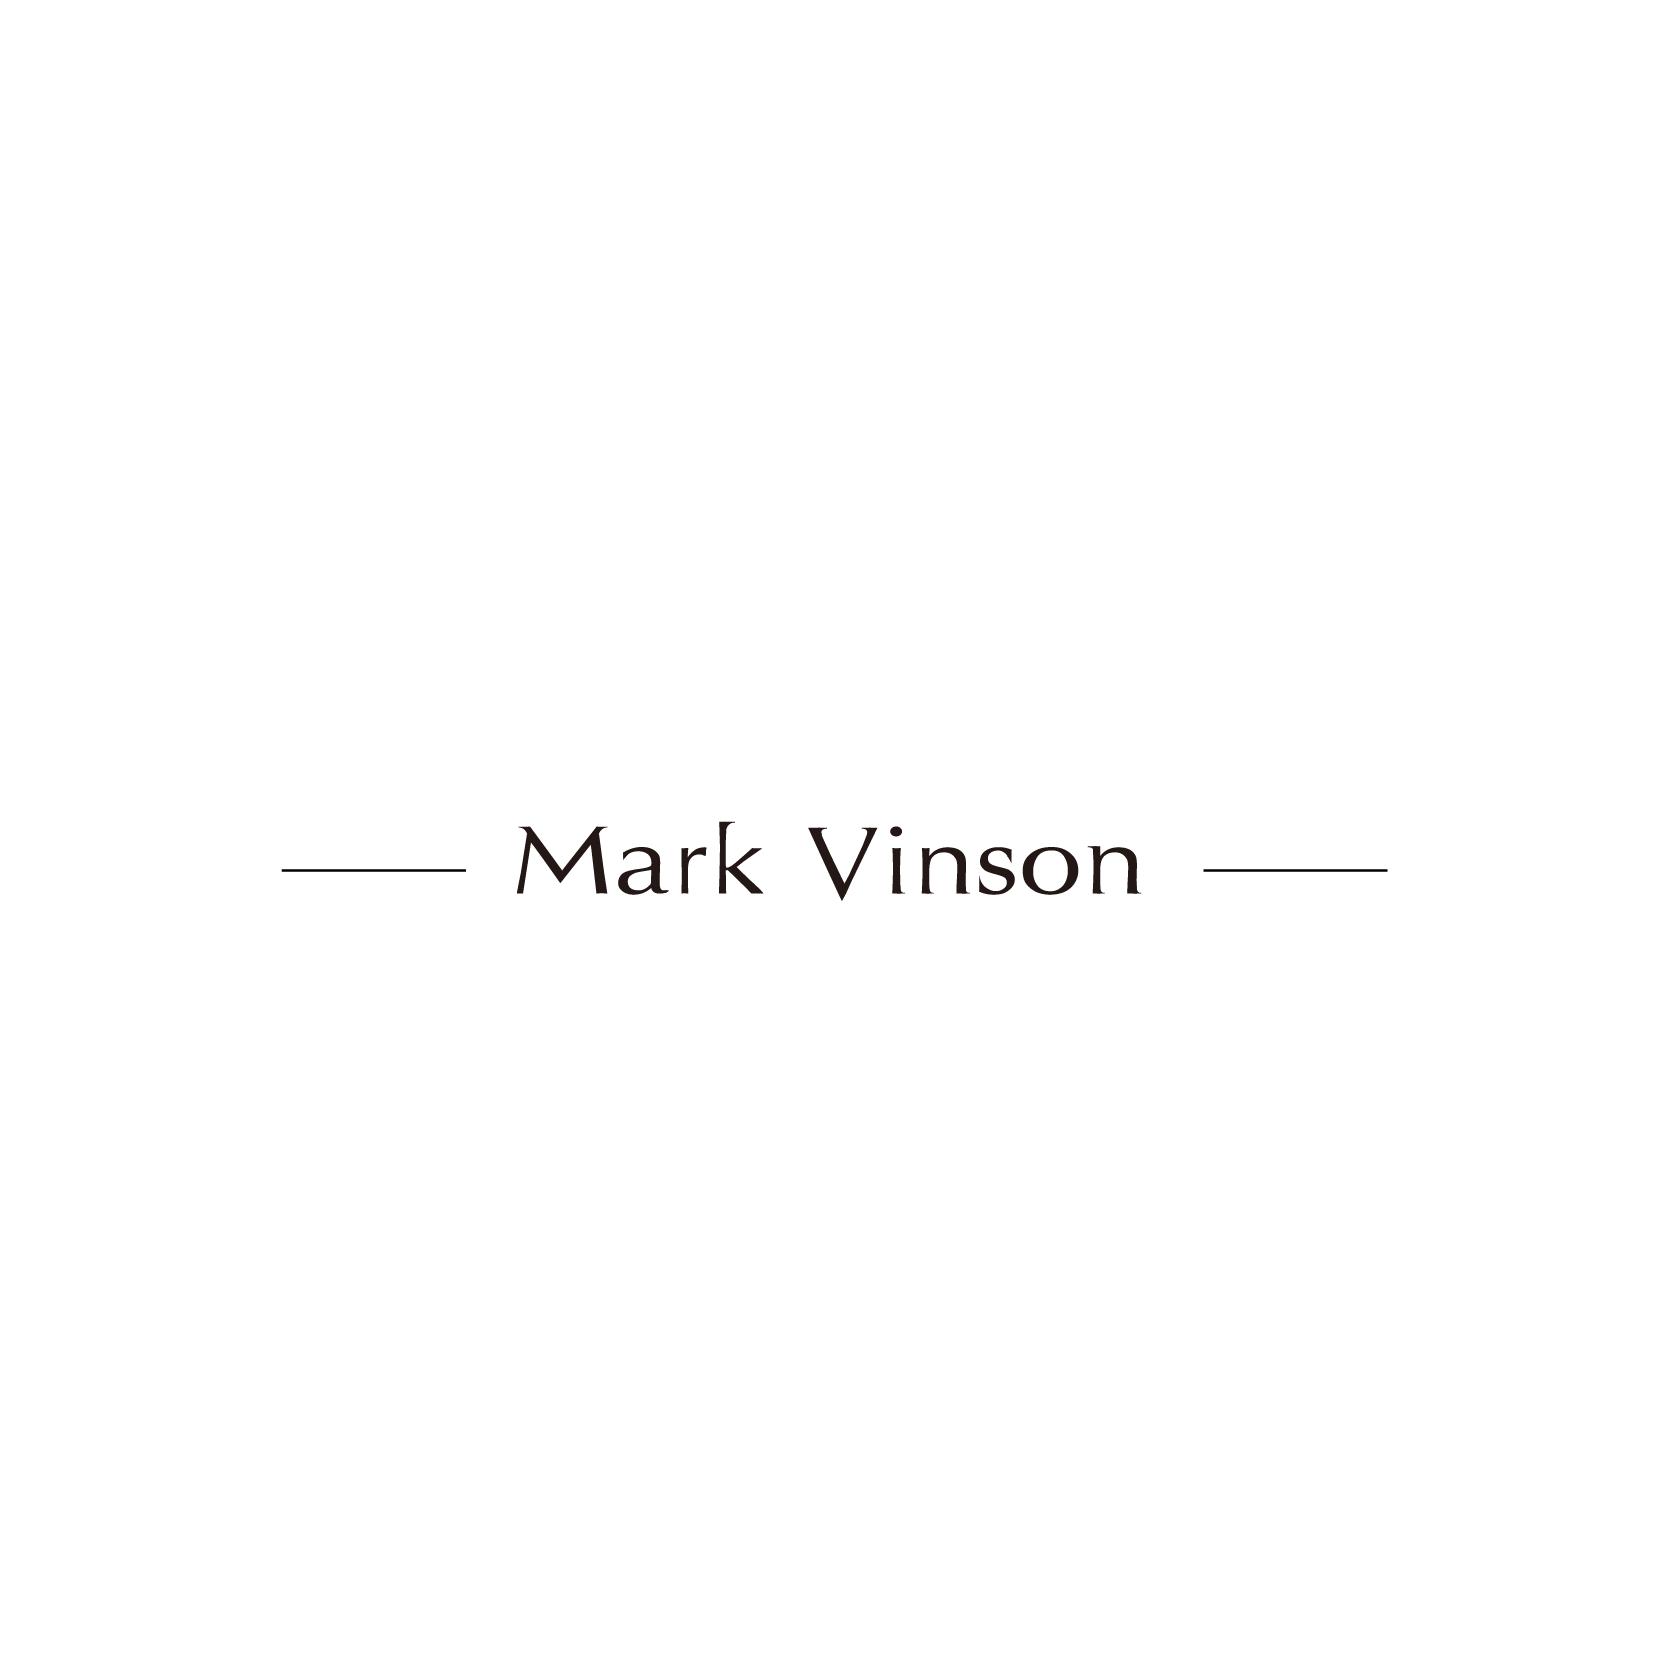 Mark Vinson